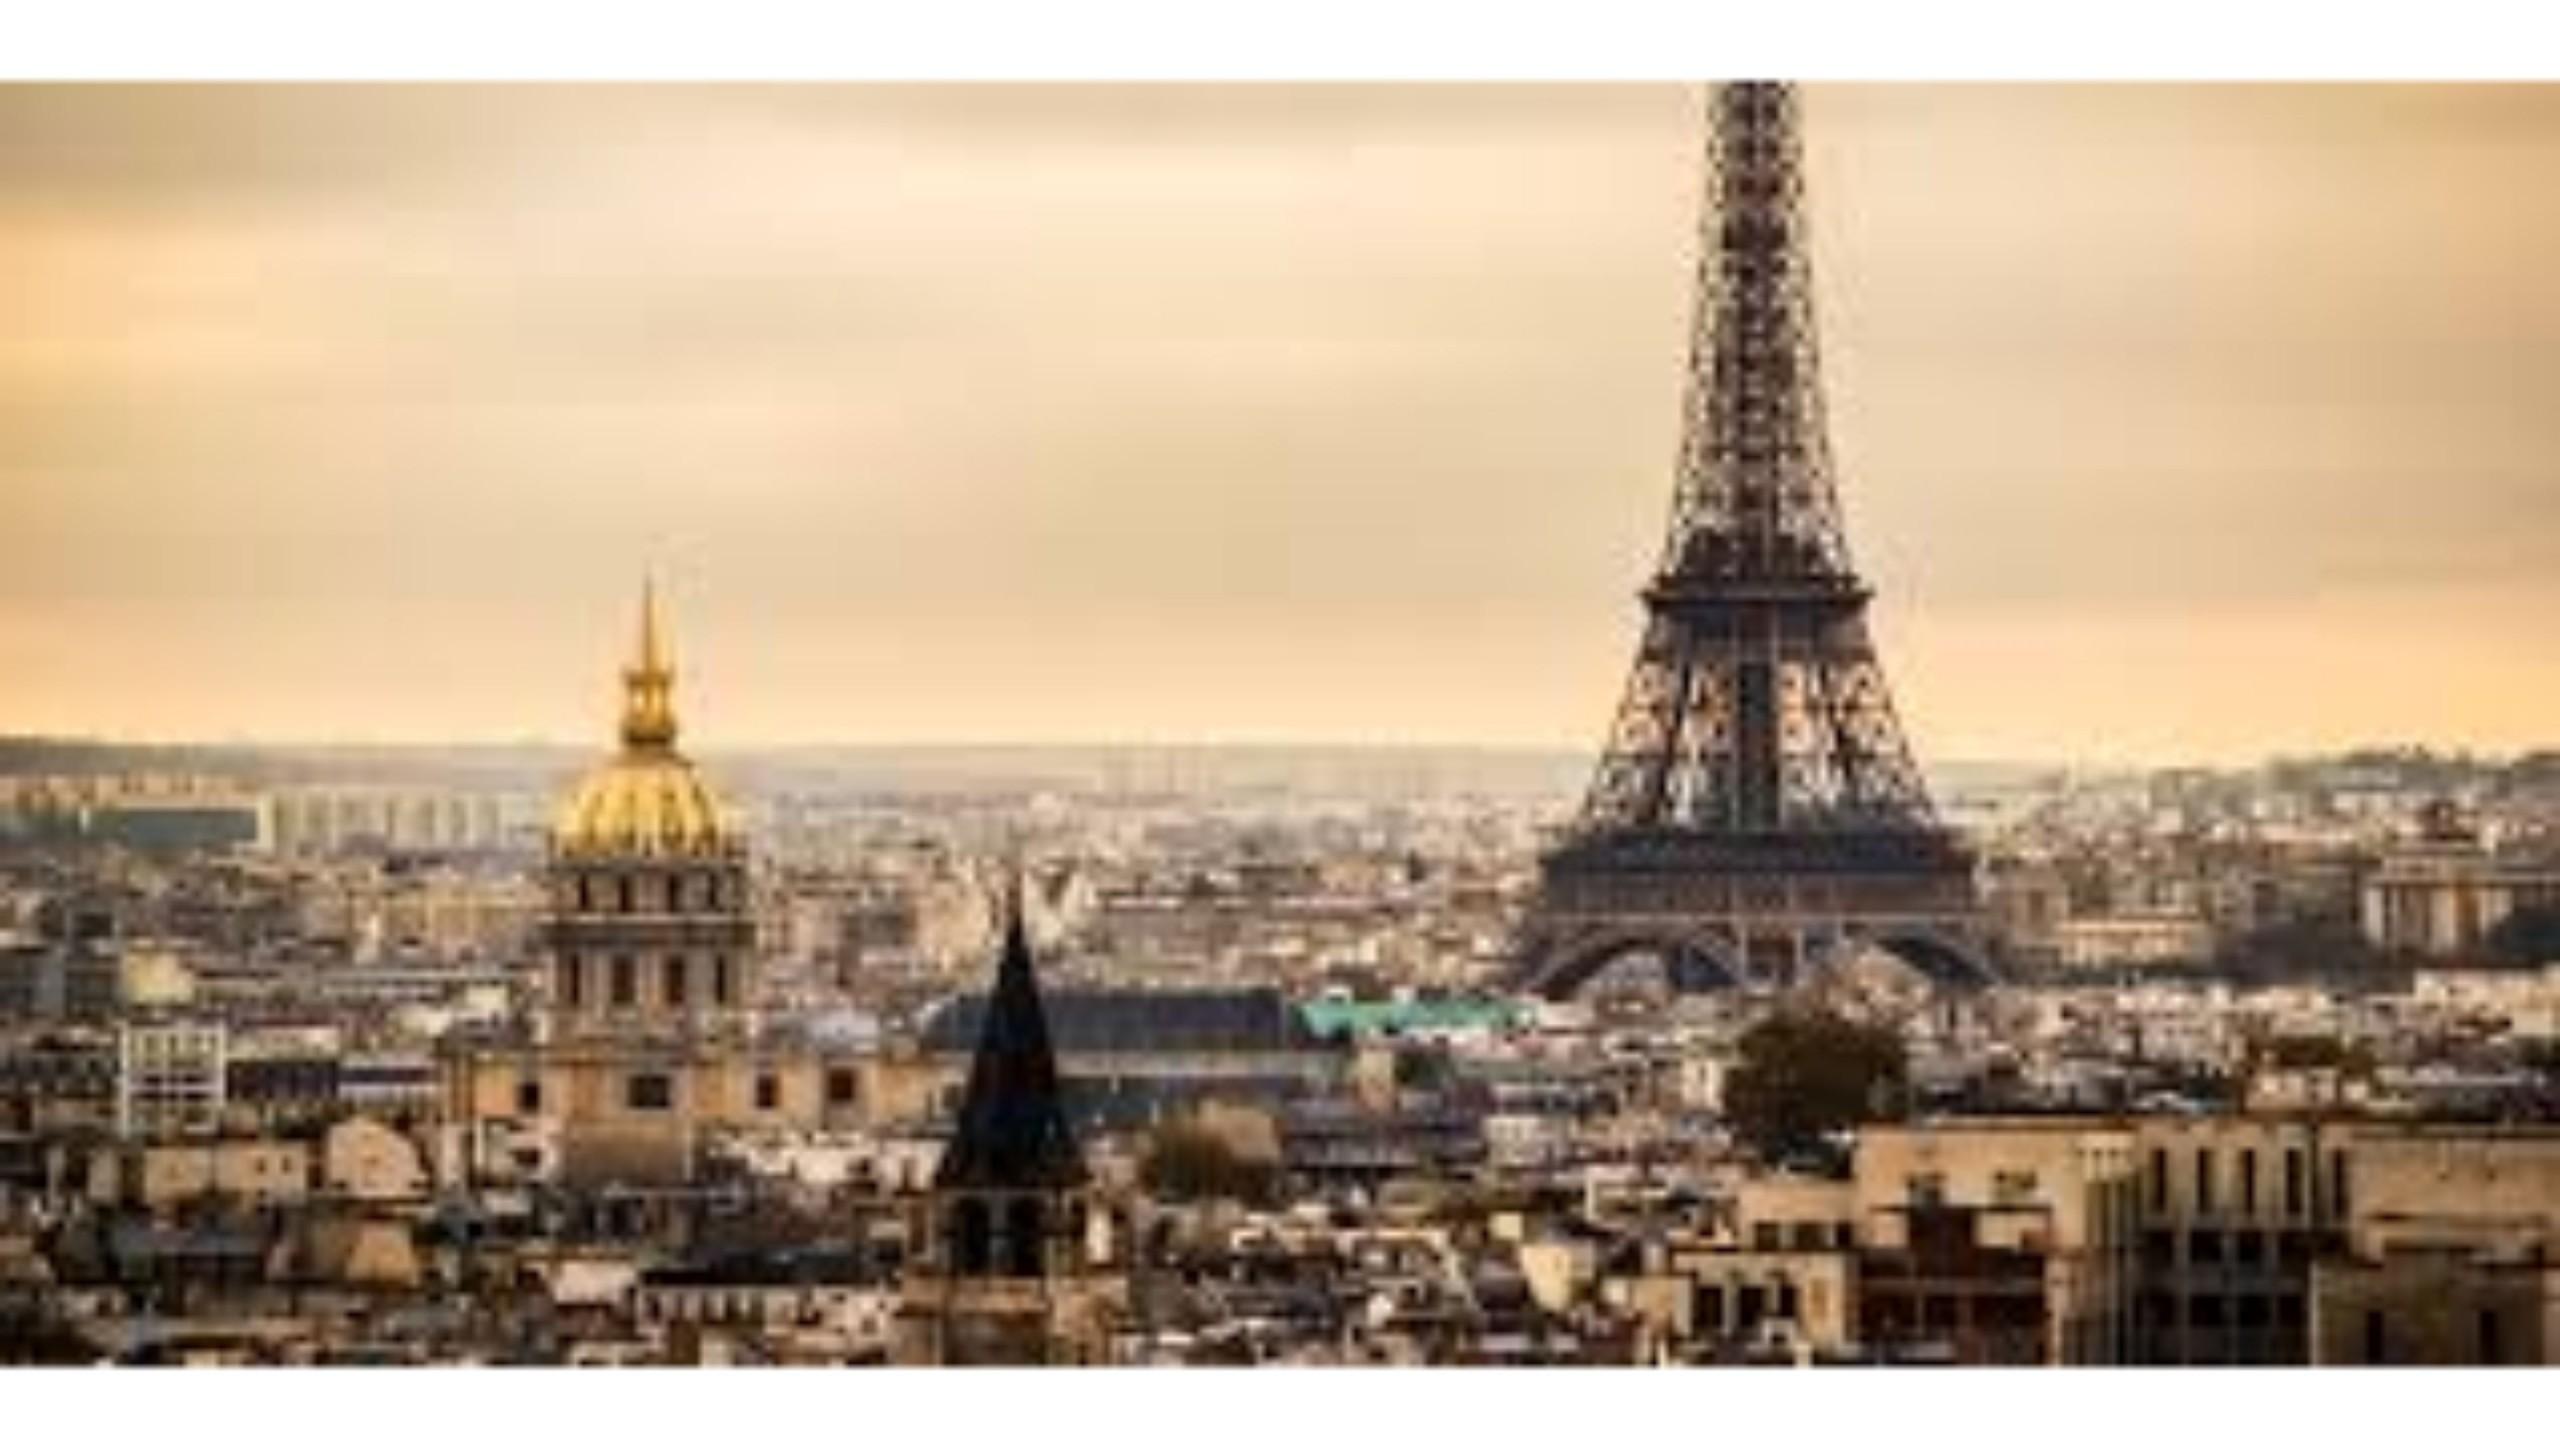 Supreme Wallpaper Hd Iphone X Paris France Wallpaper 72 Images